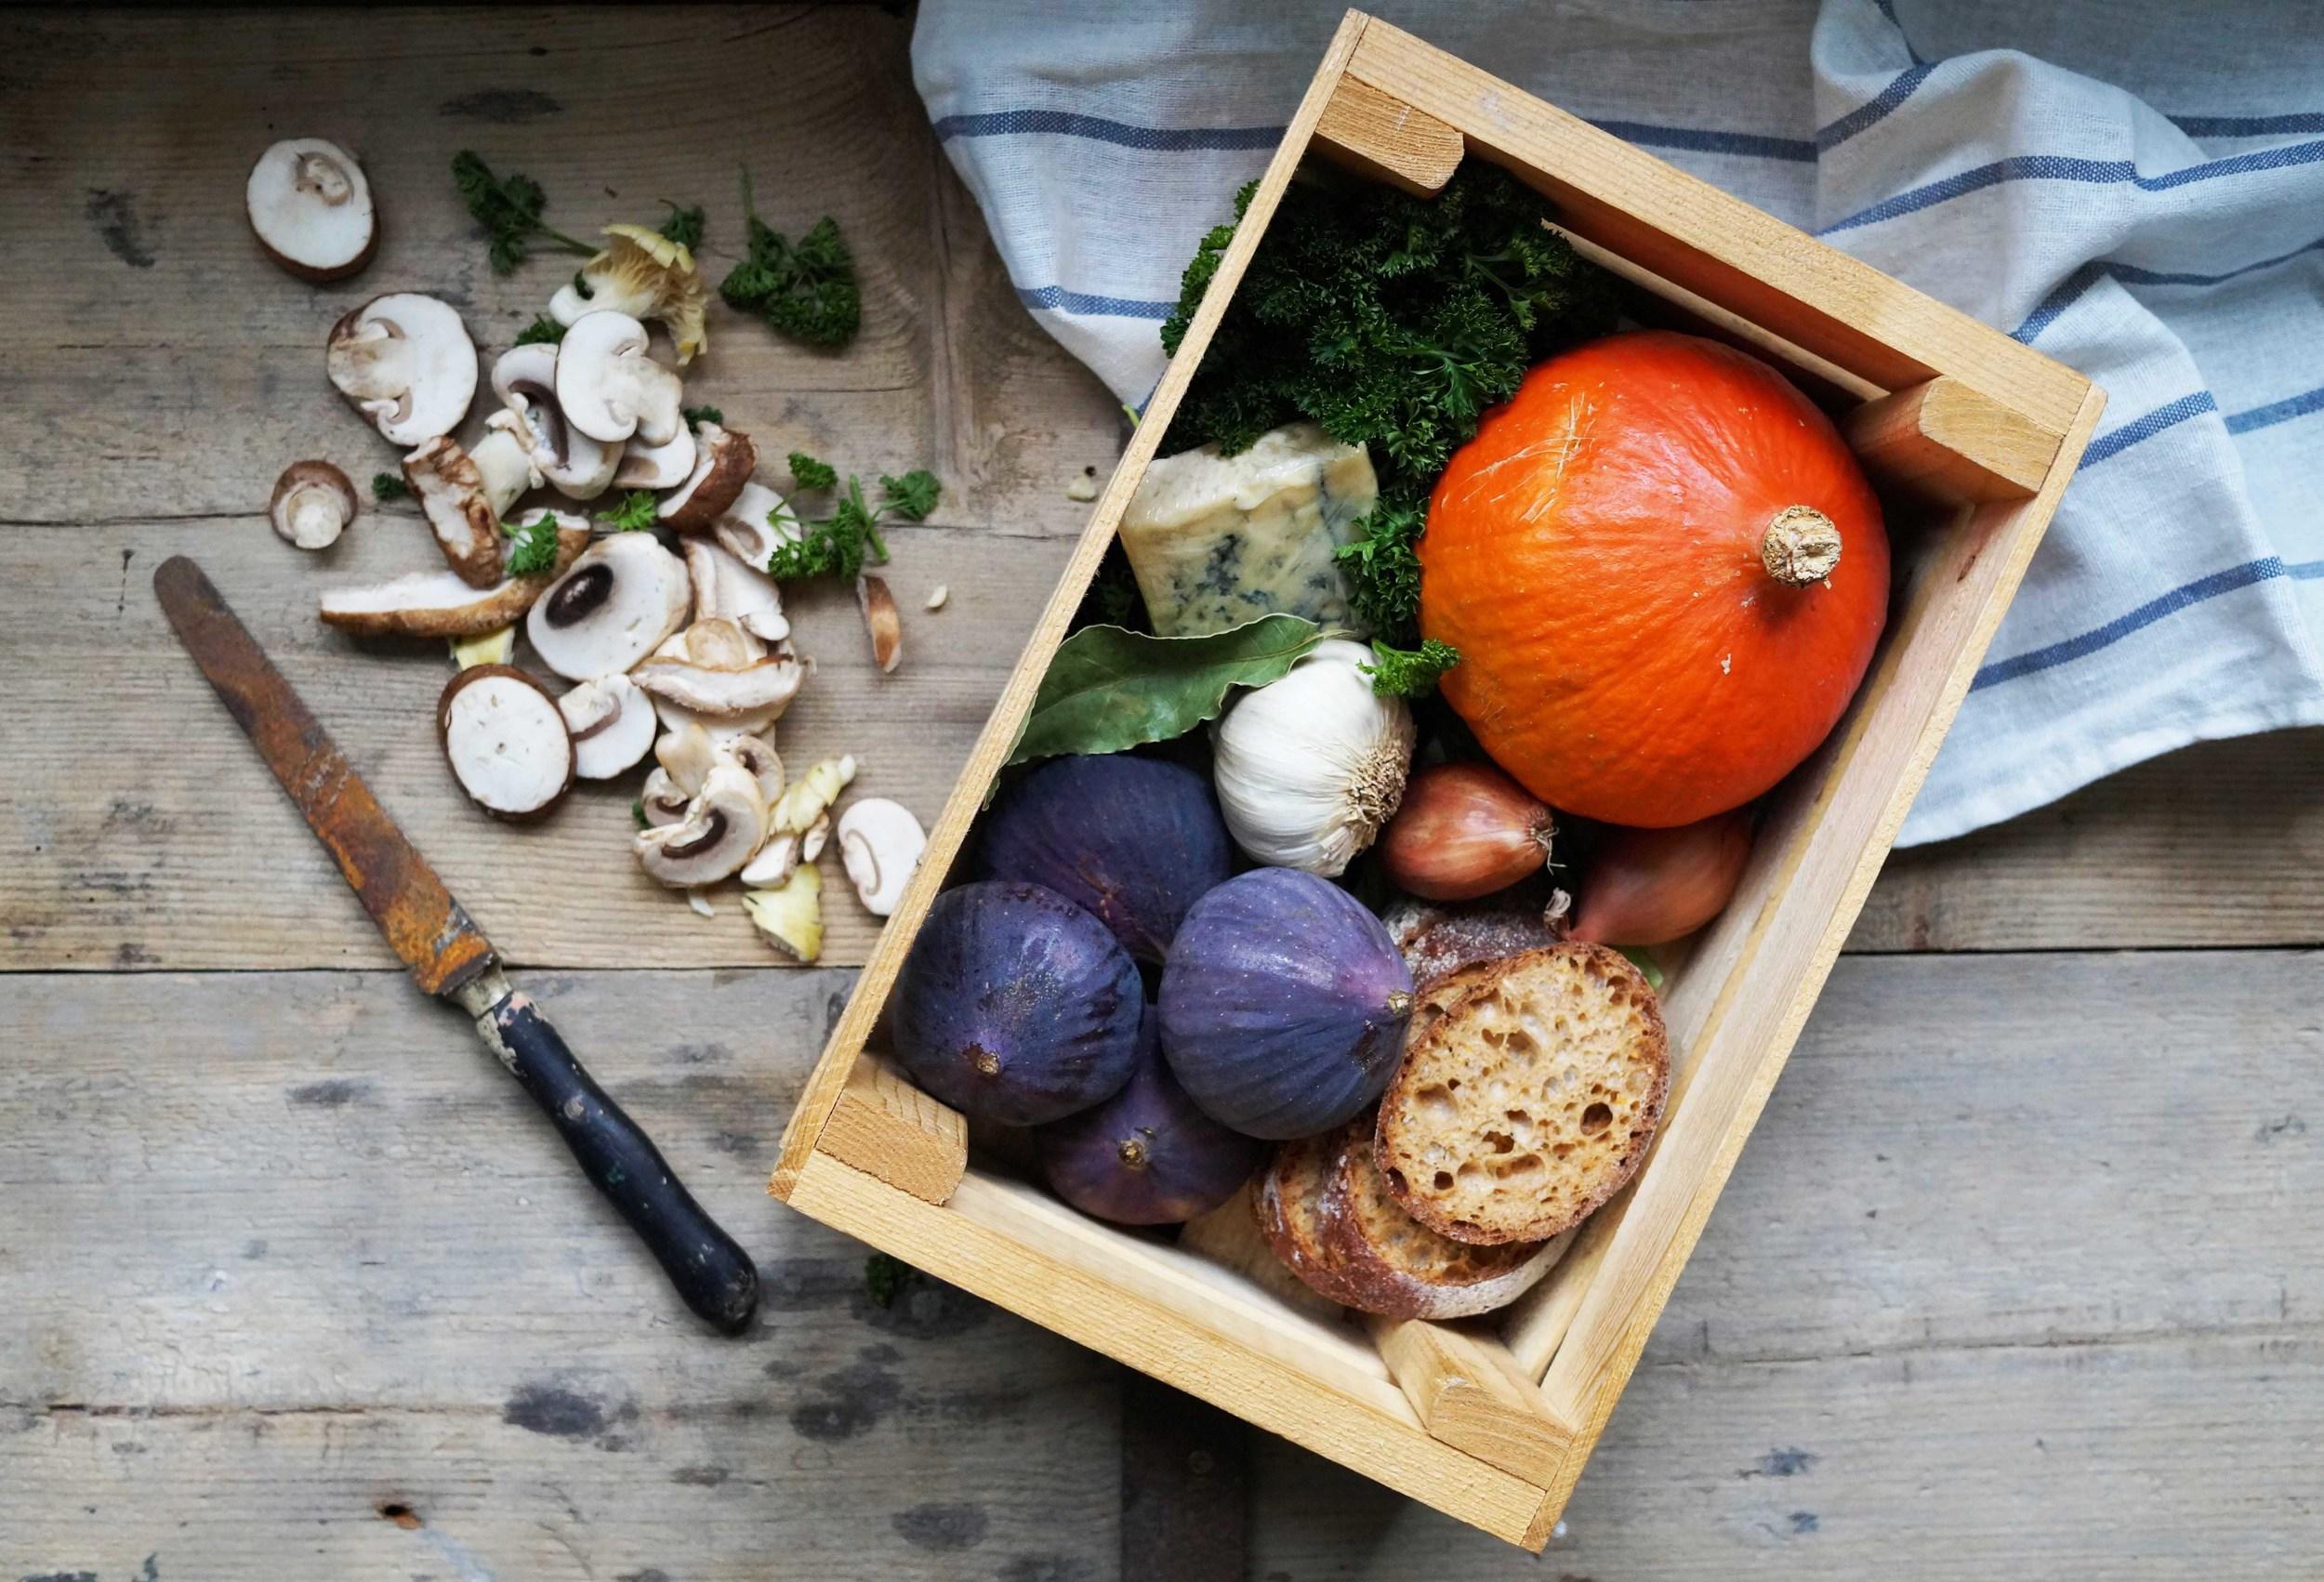 kratje met herfstige ingrediënten